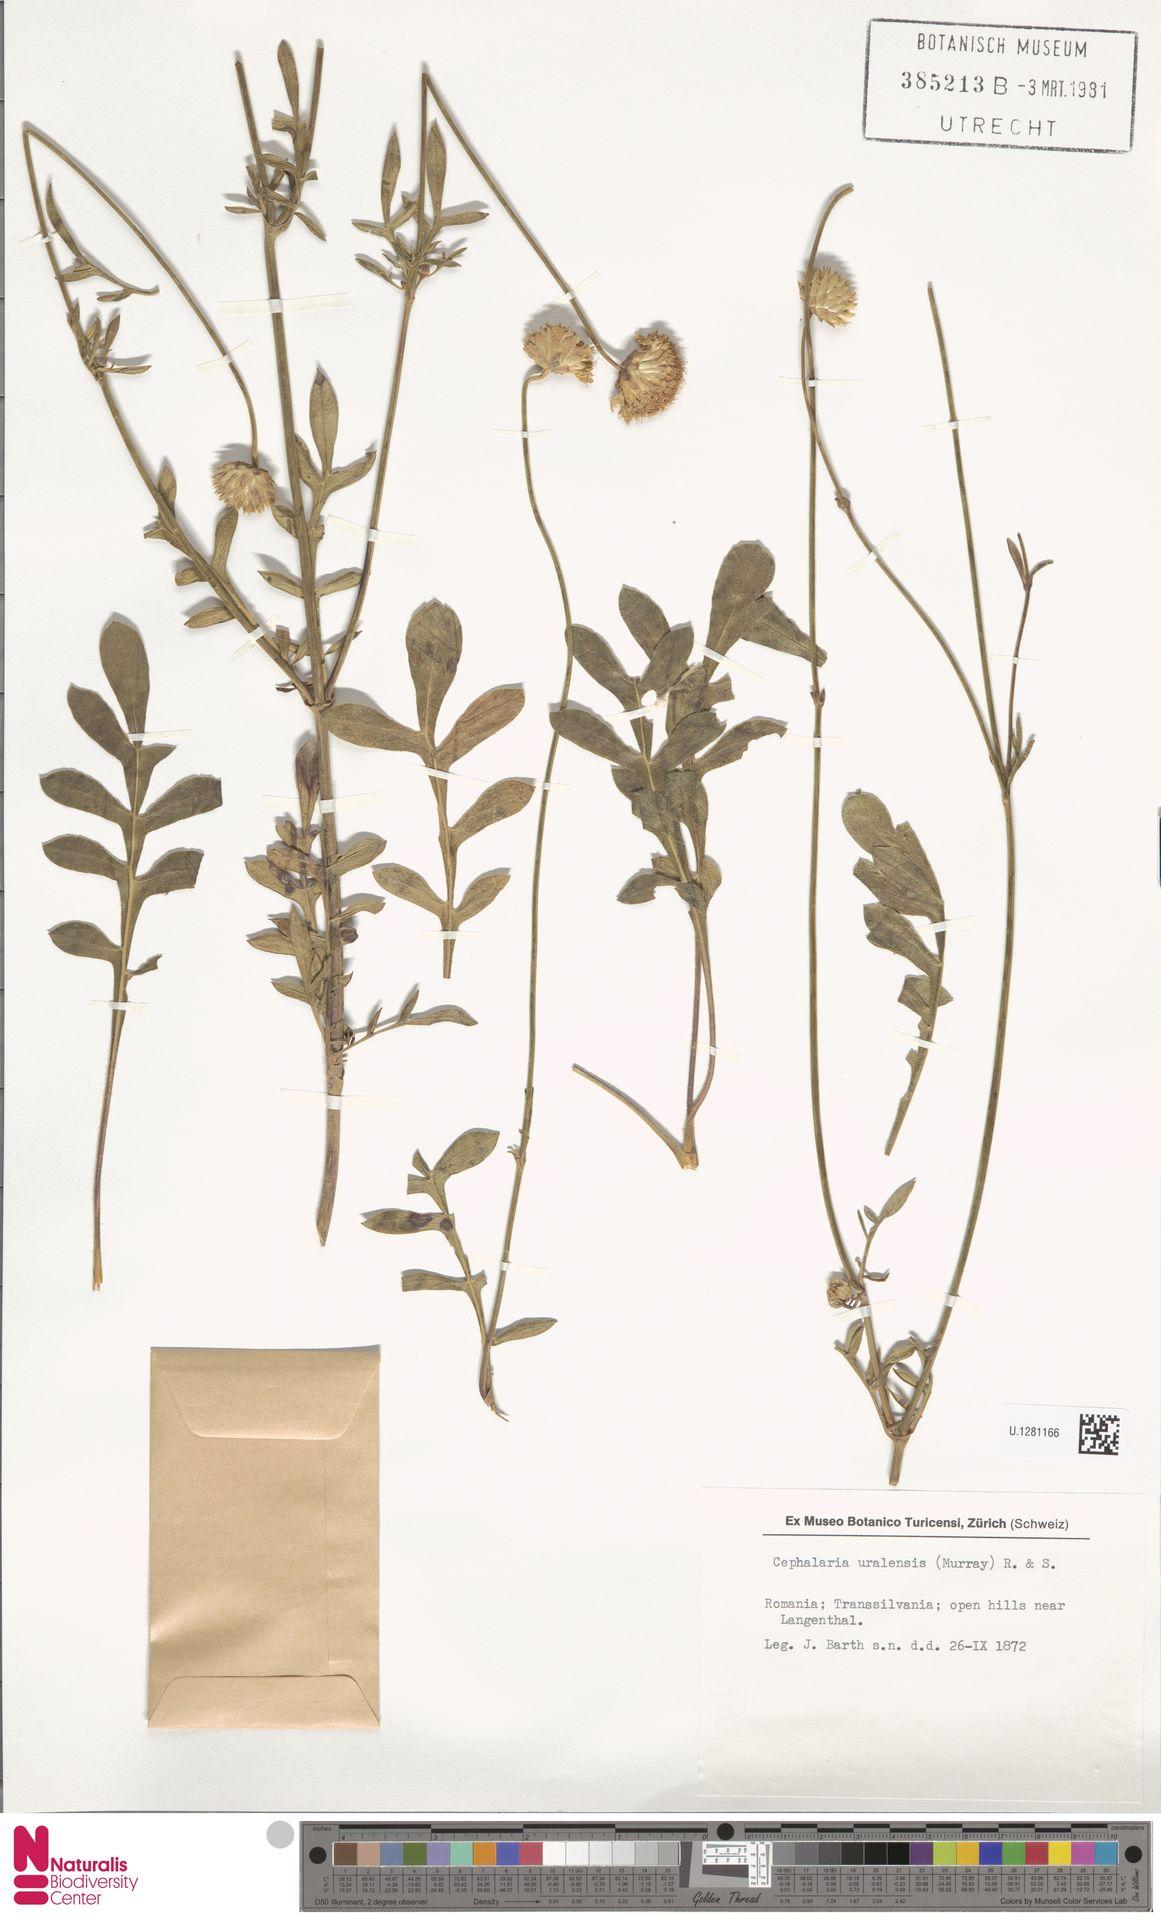 U.1281166 | Cephalaria uralensis (Murray) Roem. & Schult.